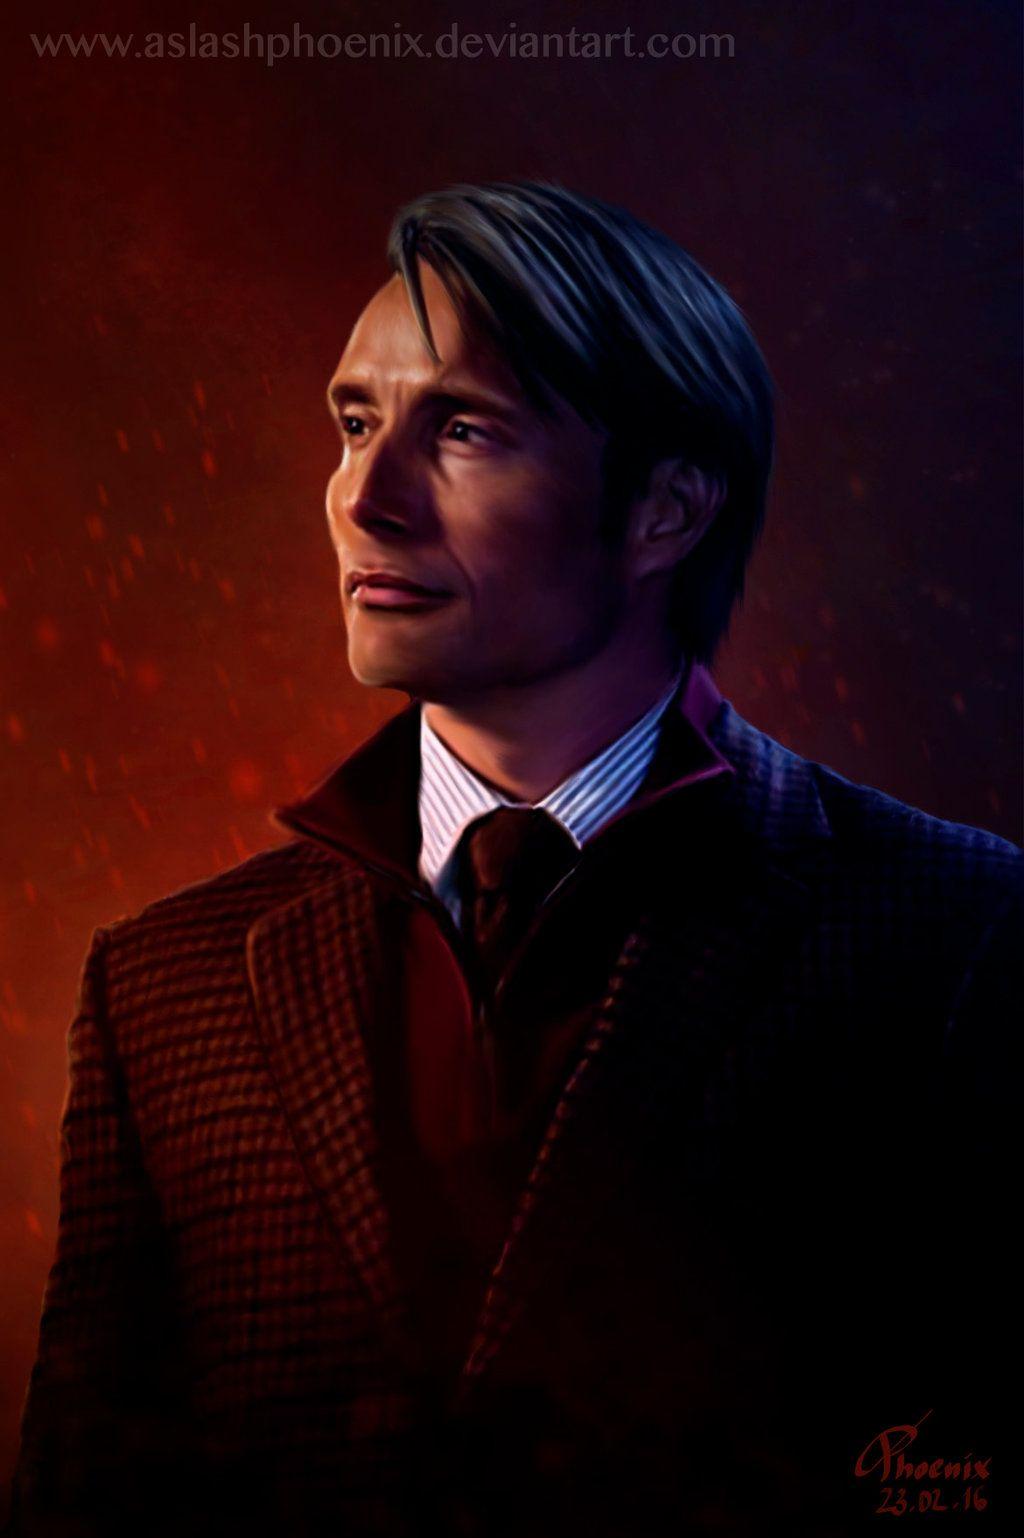 Hannibal by ASlashPhoenix.deviantart.com on @DeviantArt